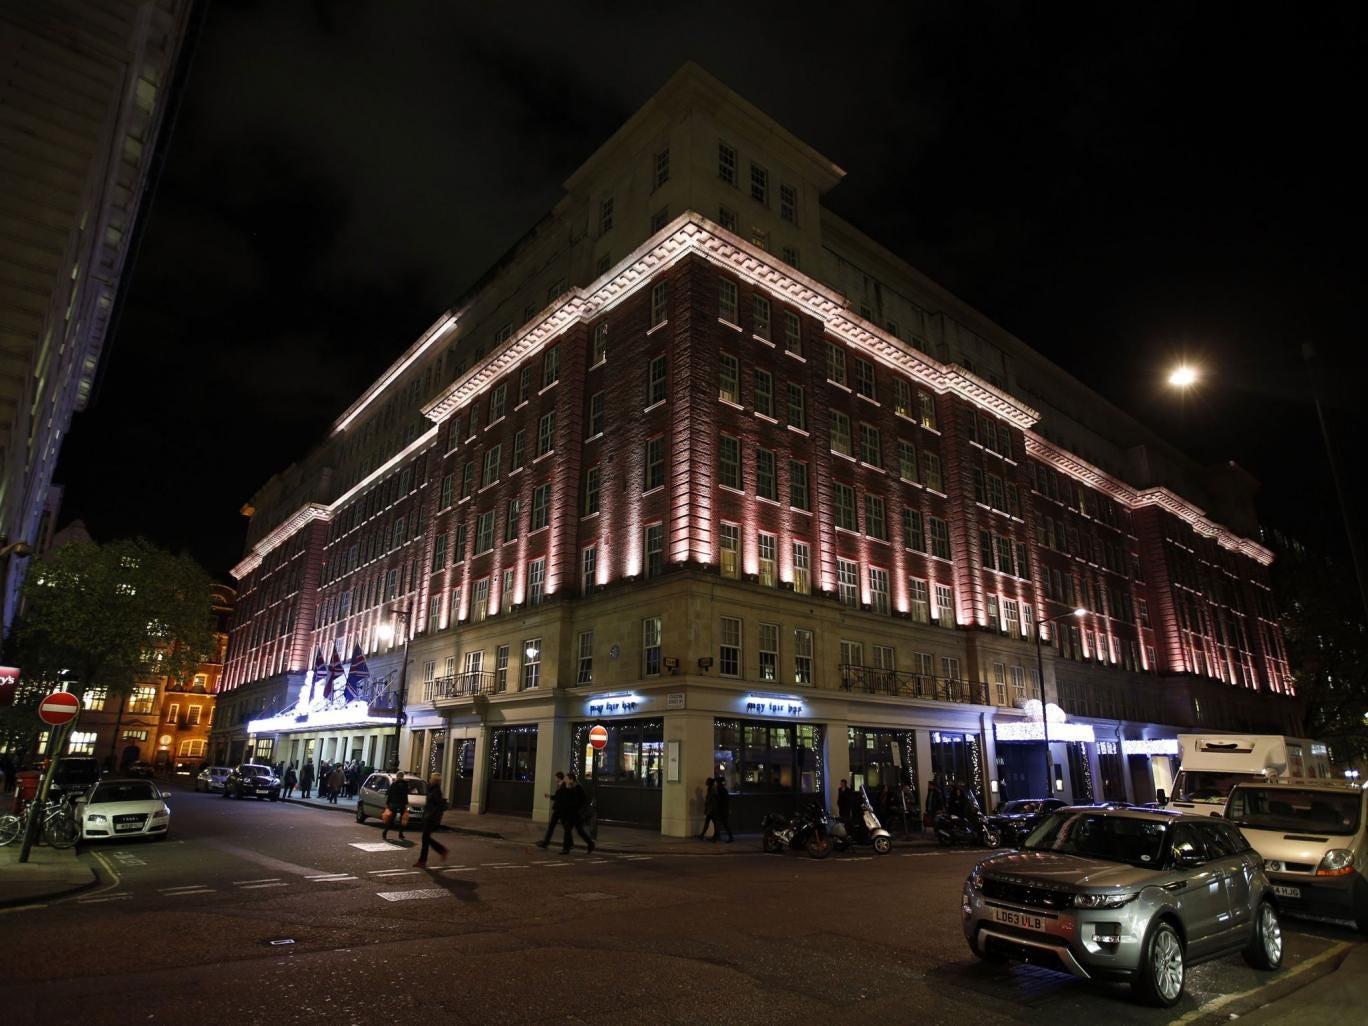 The Mayfair Hotel, Stratton Street, London